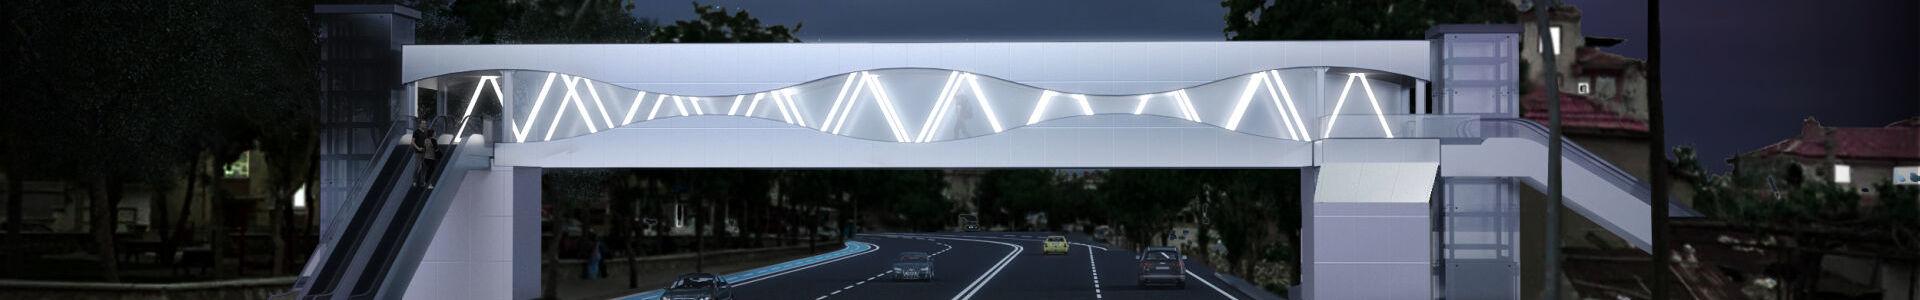 Karaman Pedestrian Bridges